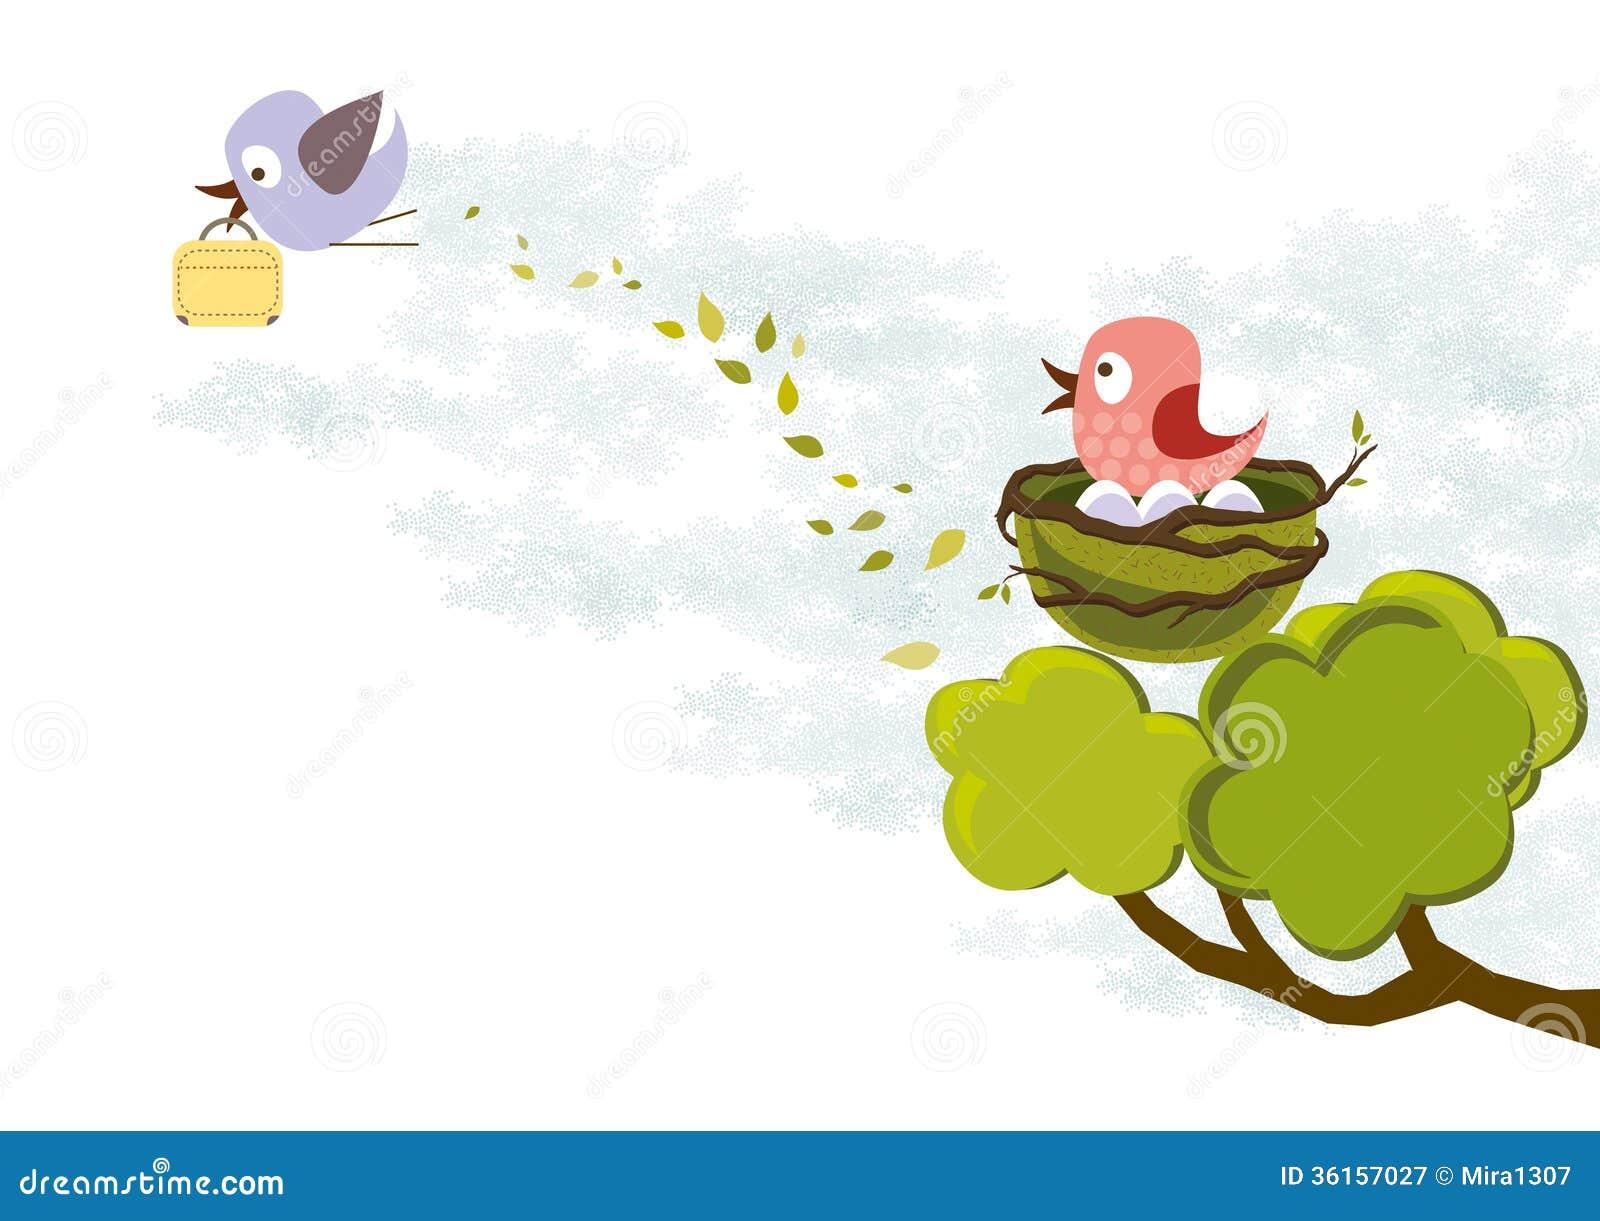 Baby birds flying from nest